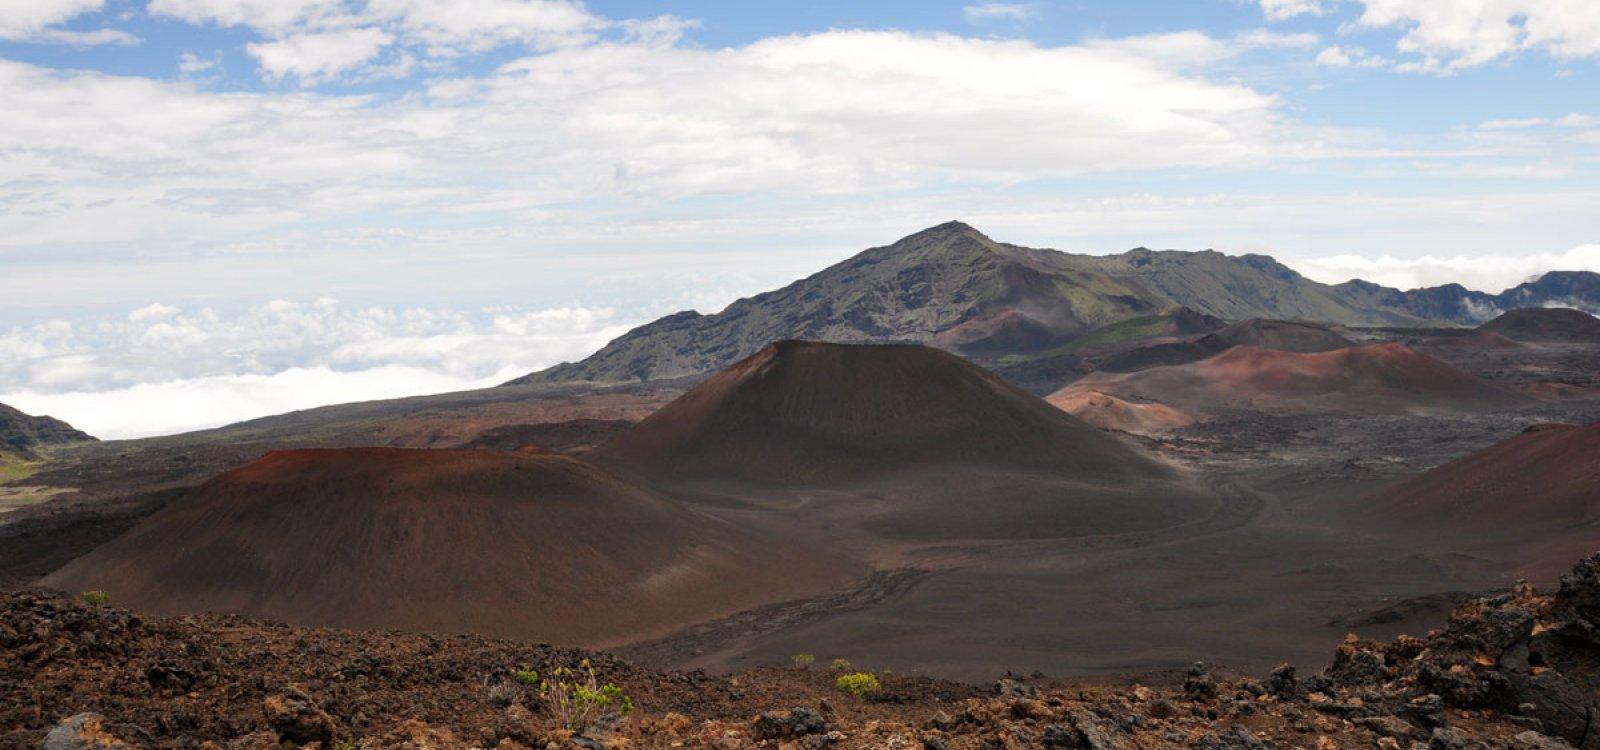 Haleakala Crater clipart #5, Download drawings